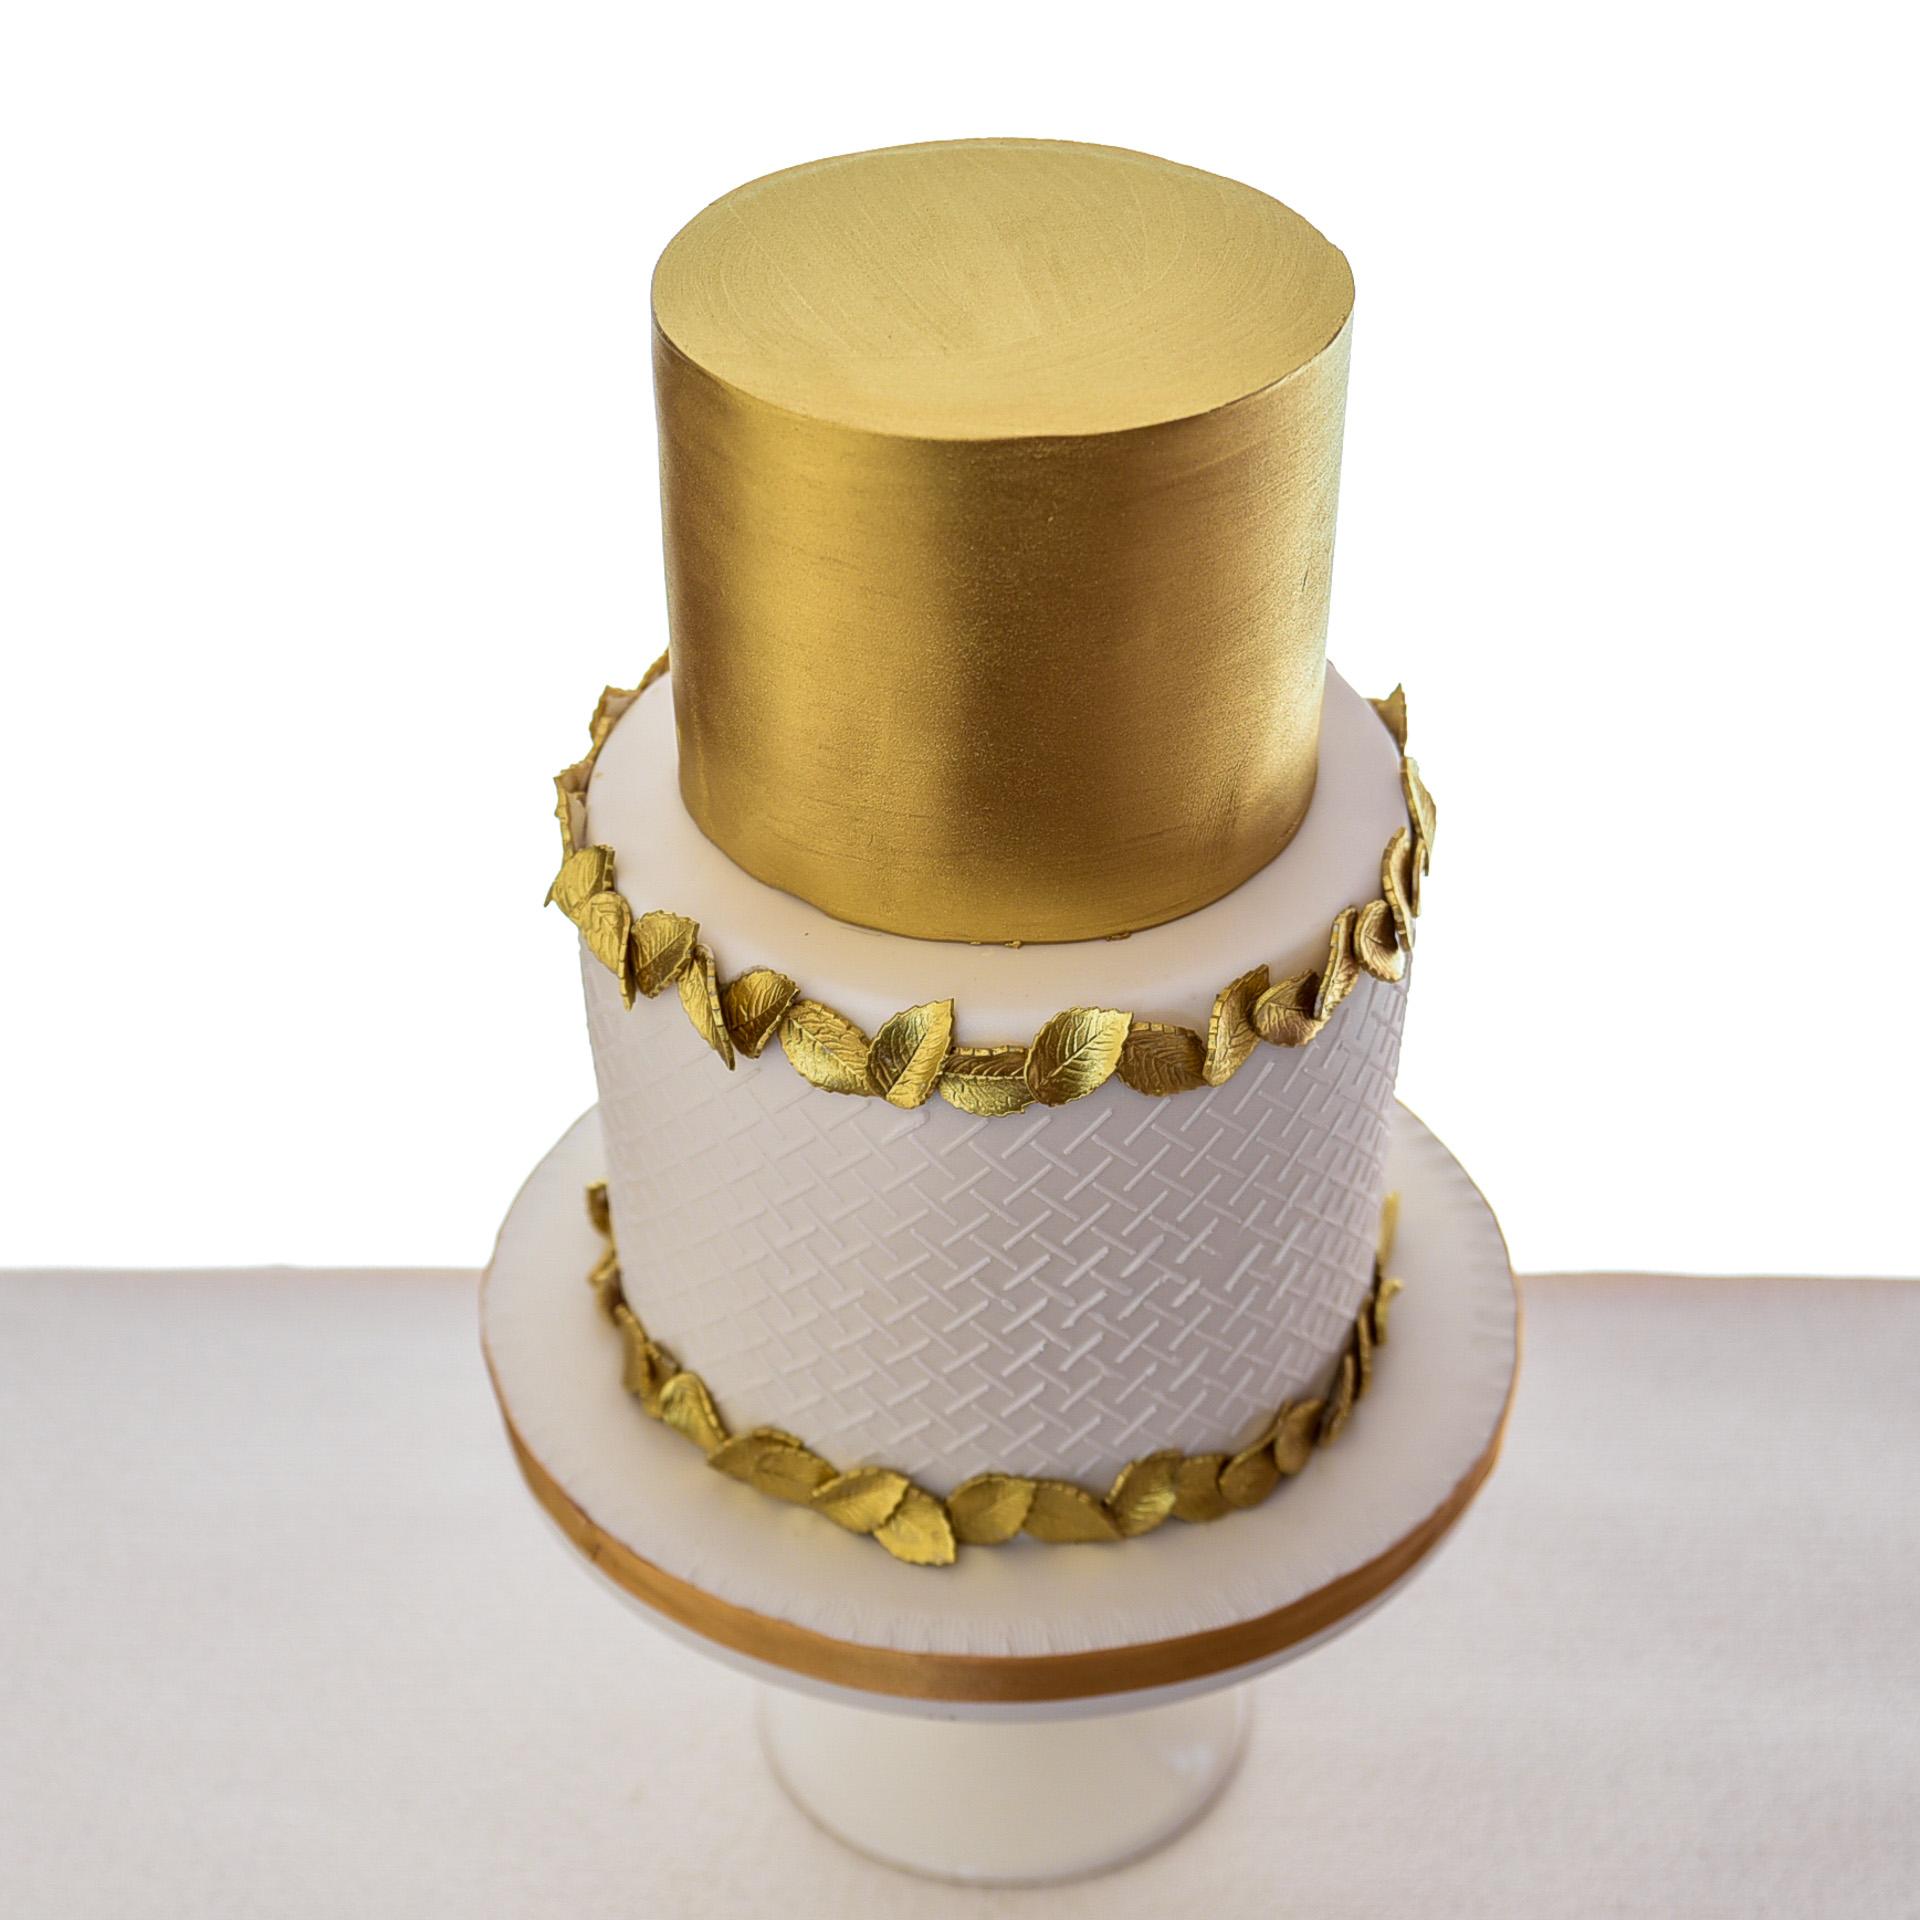 Gold-and-White-Wedding-Cake.jpg